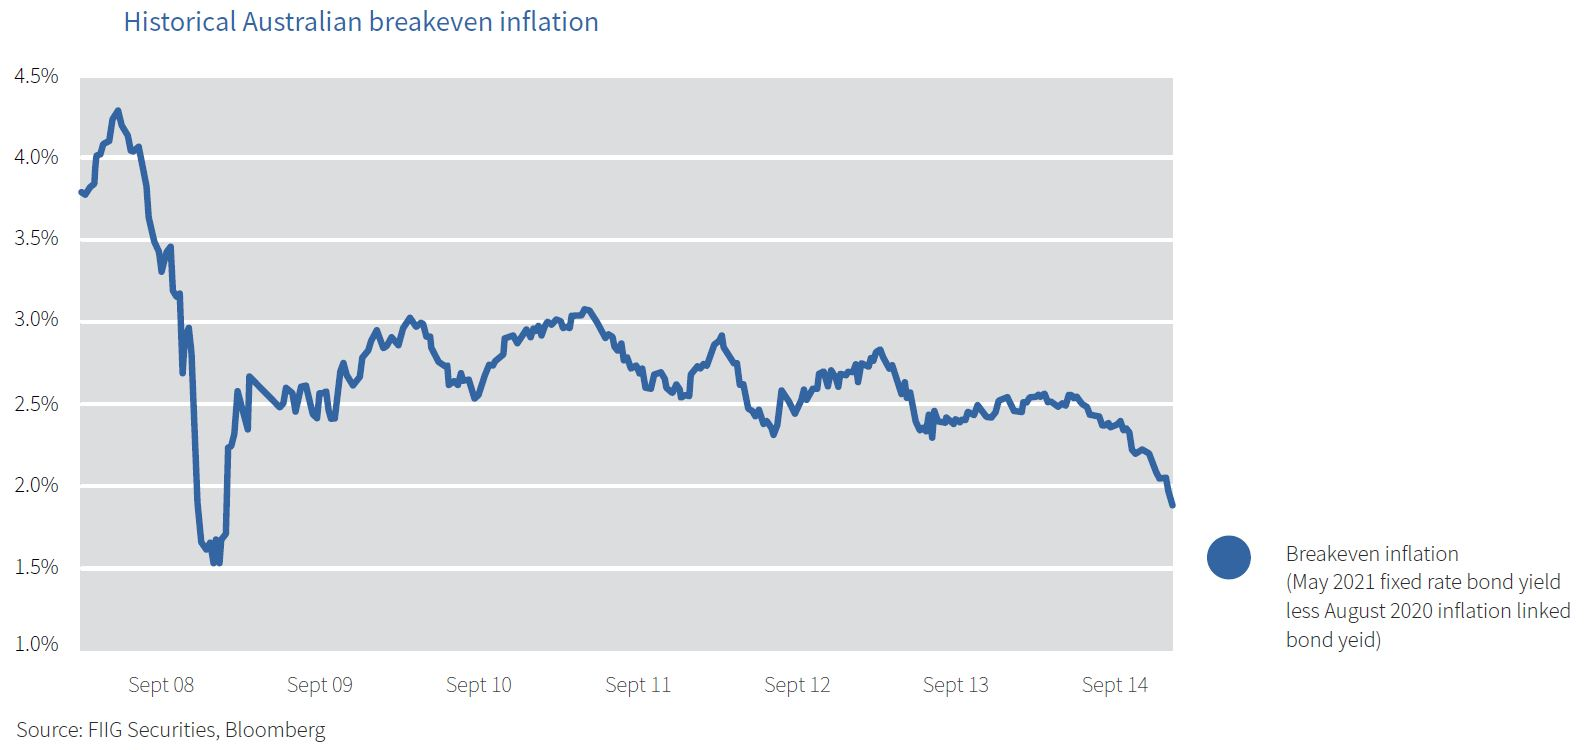 historical break even inflation